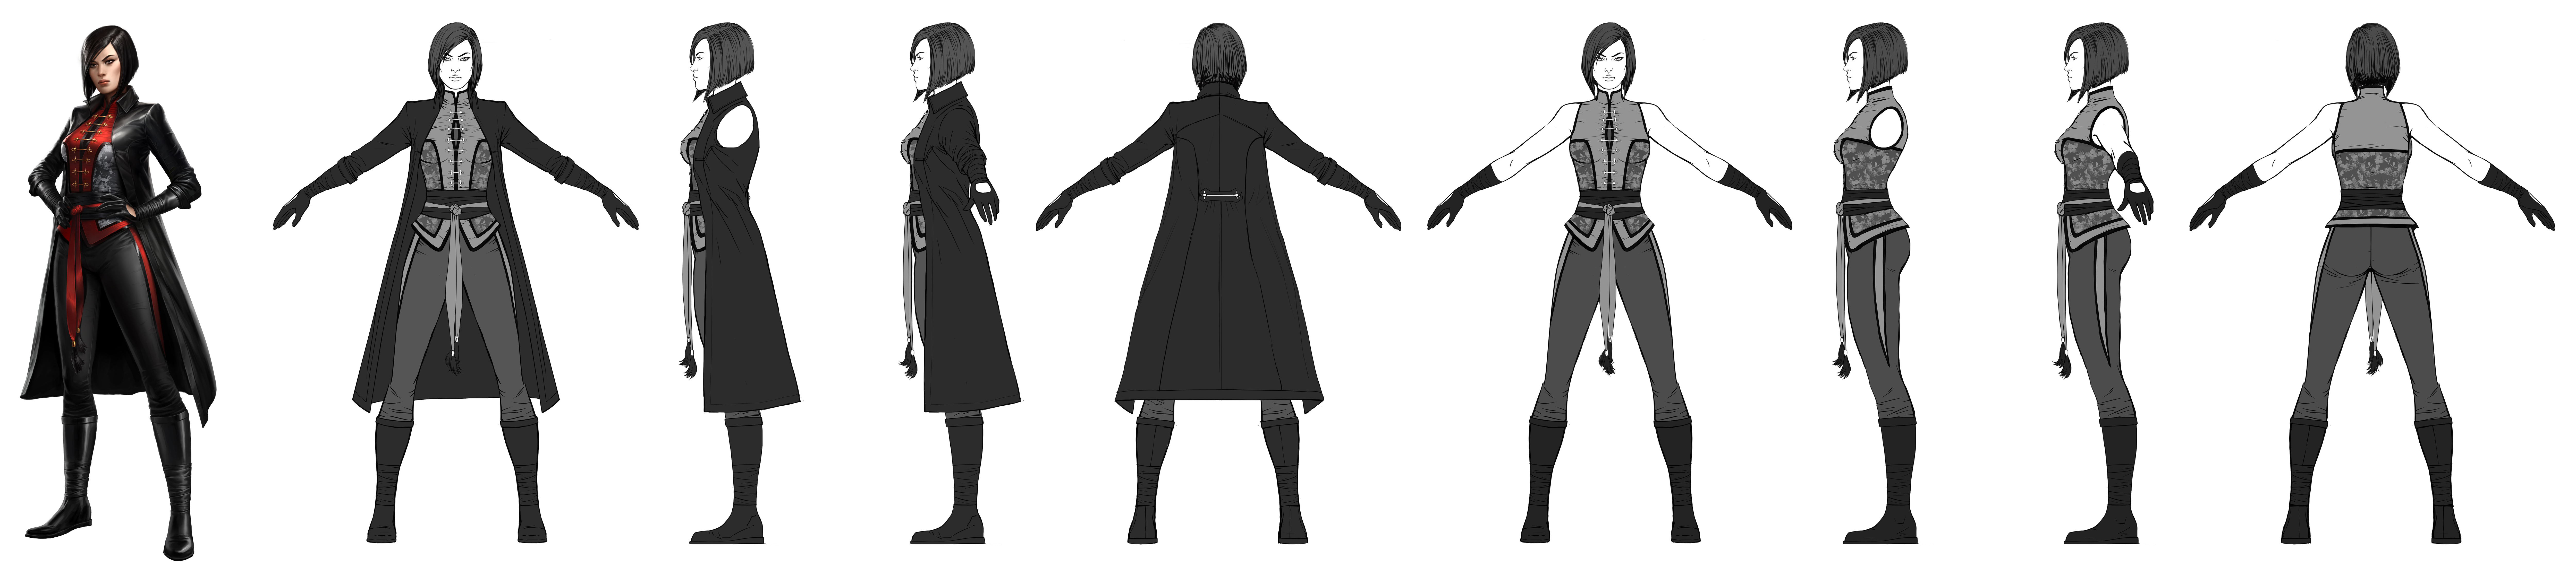 Characters: Human - Page 2 71ia60962cc37ede0c1_by_tamamonomae1112-dbao13s